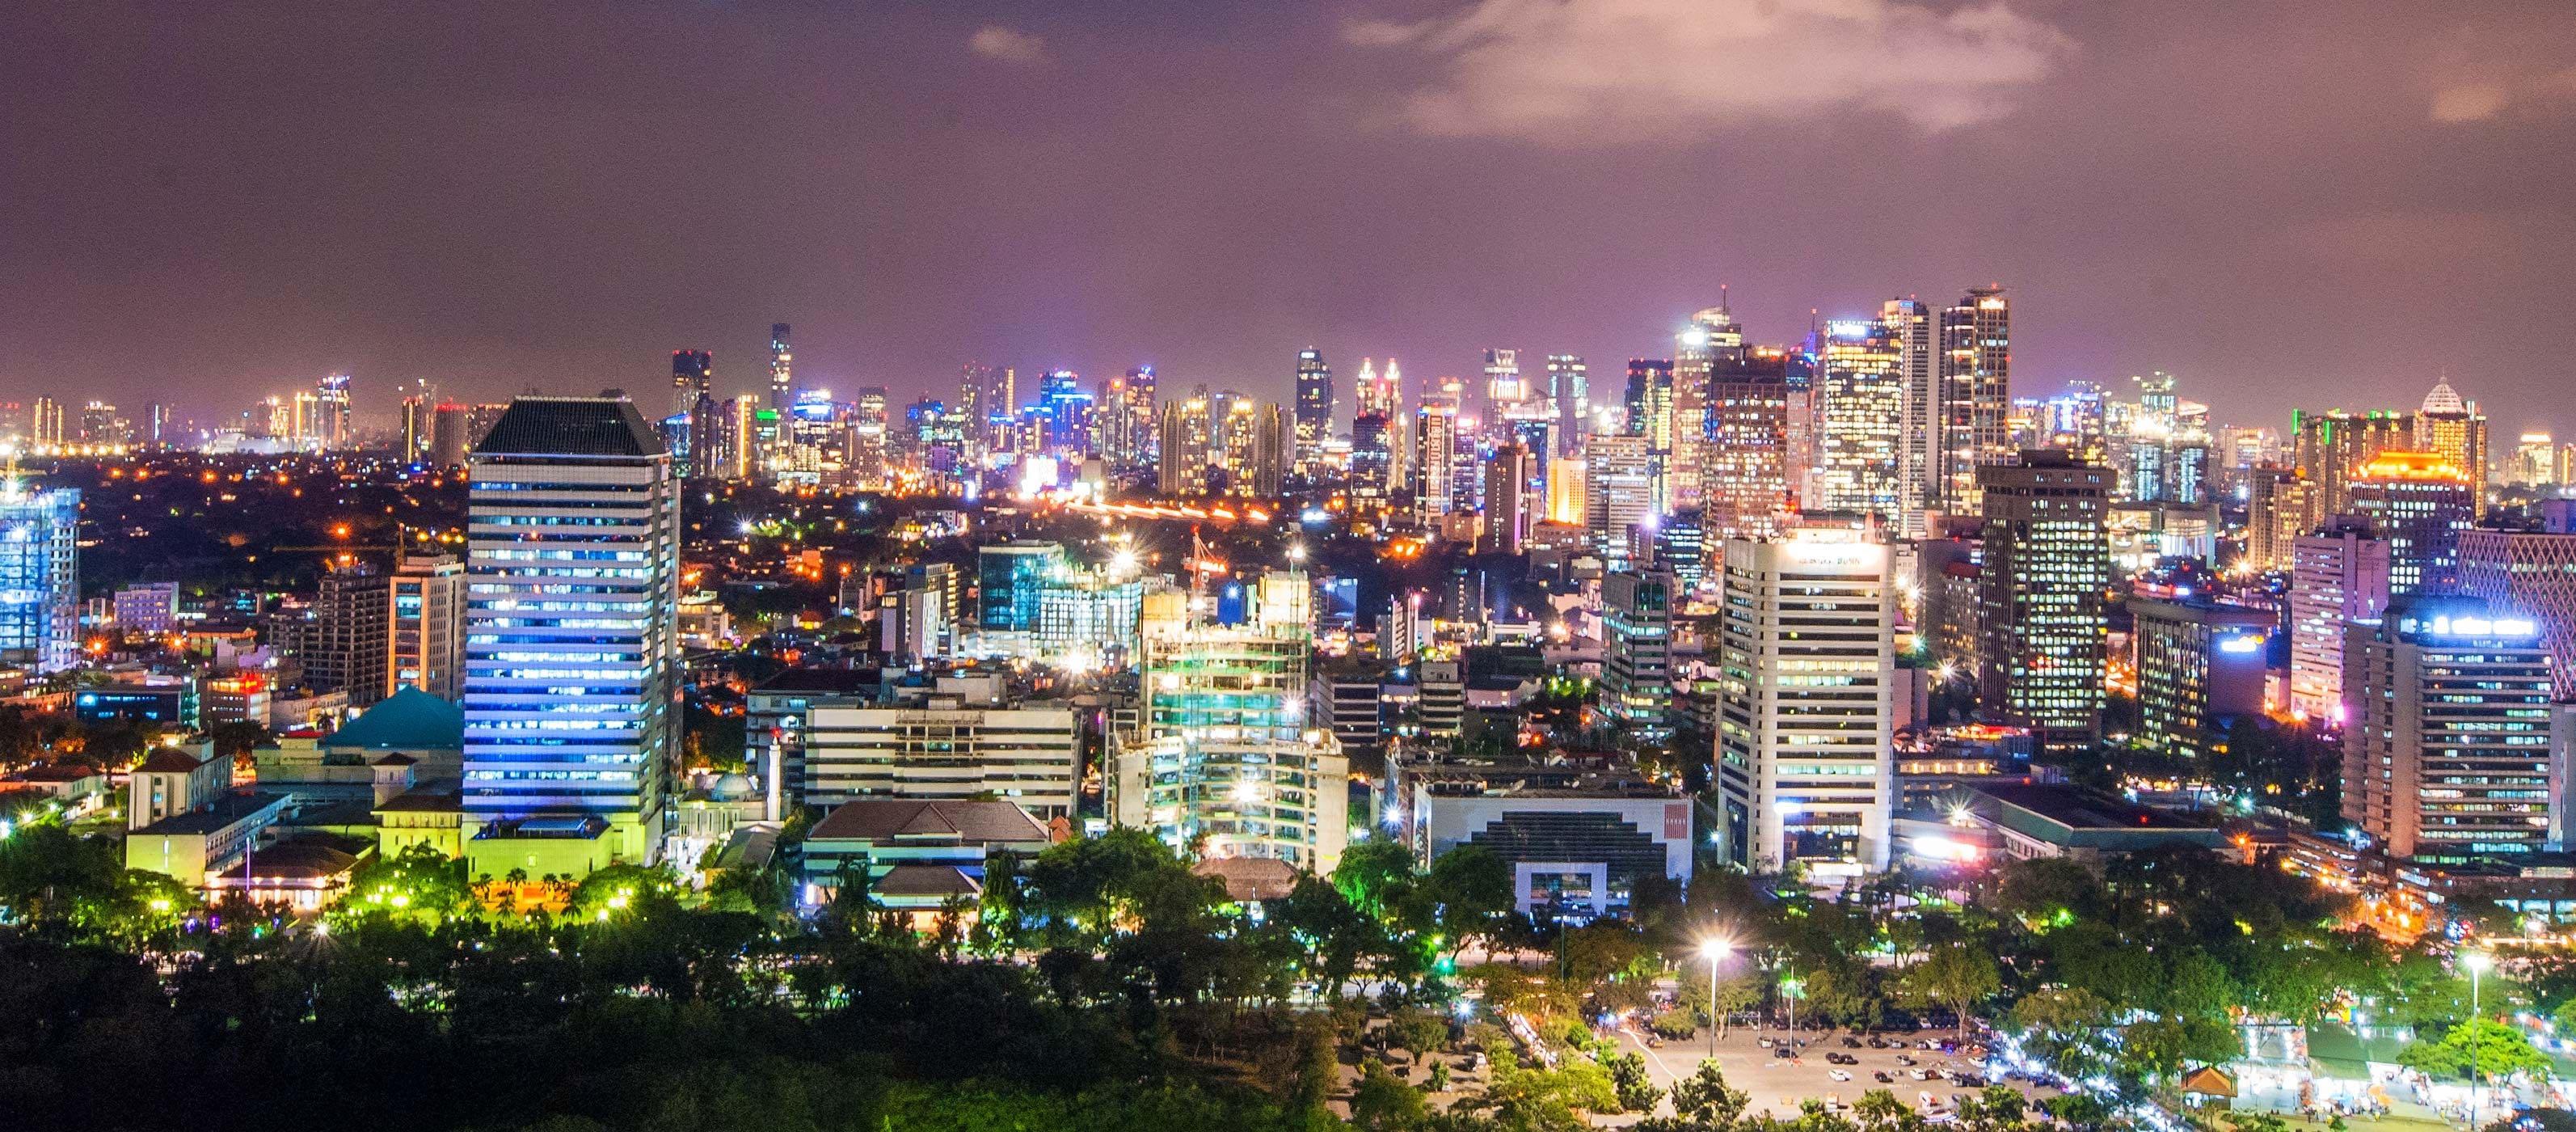 Indonesia image 001